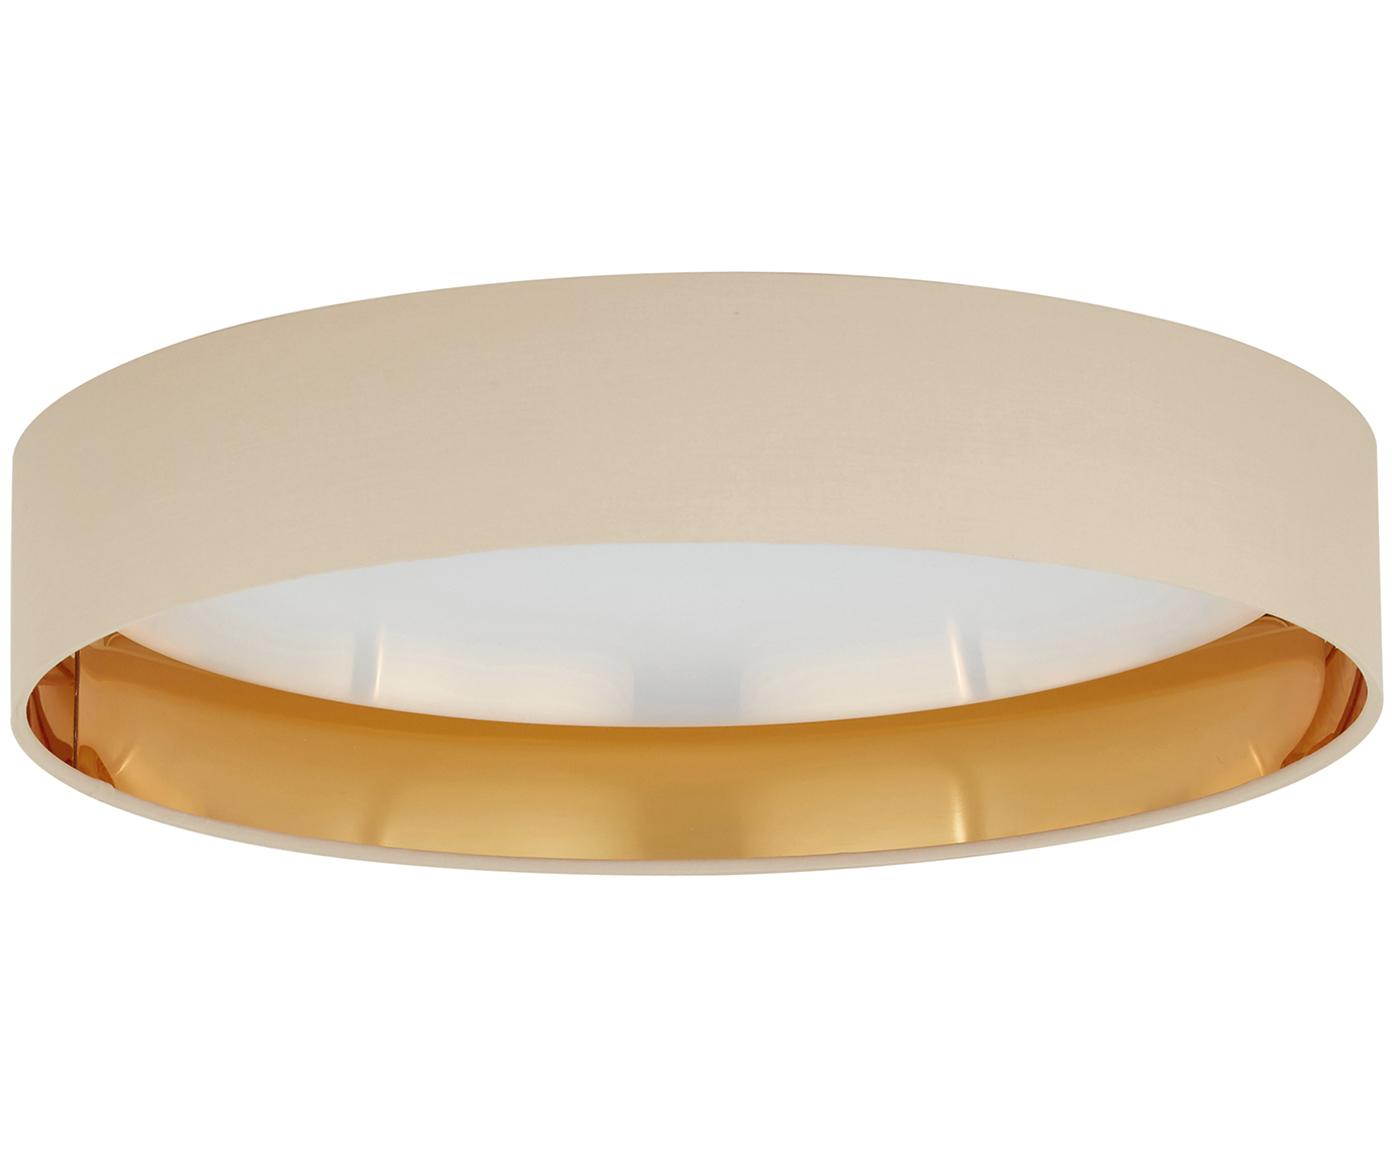 Plafoniera a LED Mallory, Cornice: metallo, Taupe, Ø 41 x Alt. 10 cm